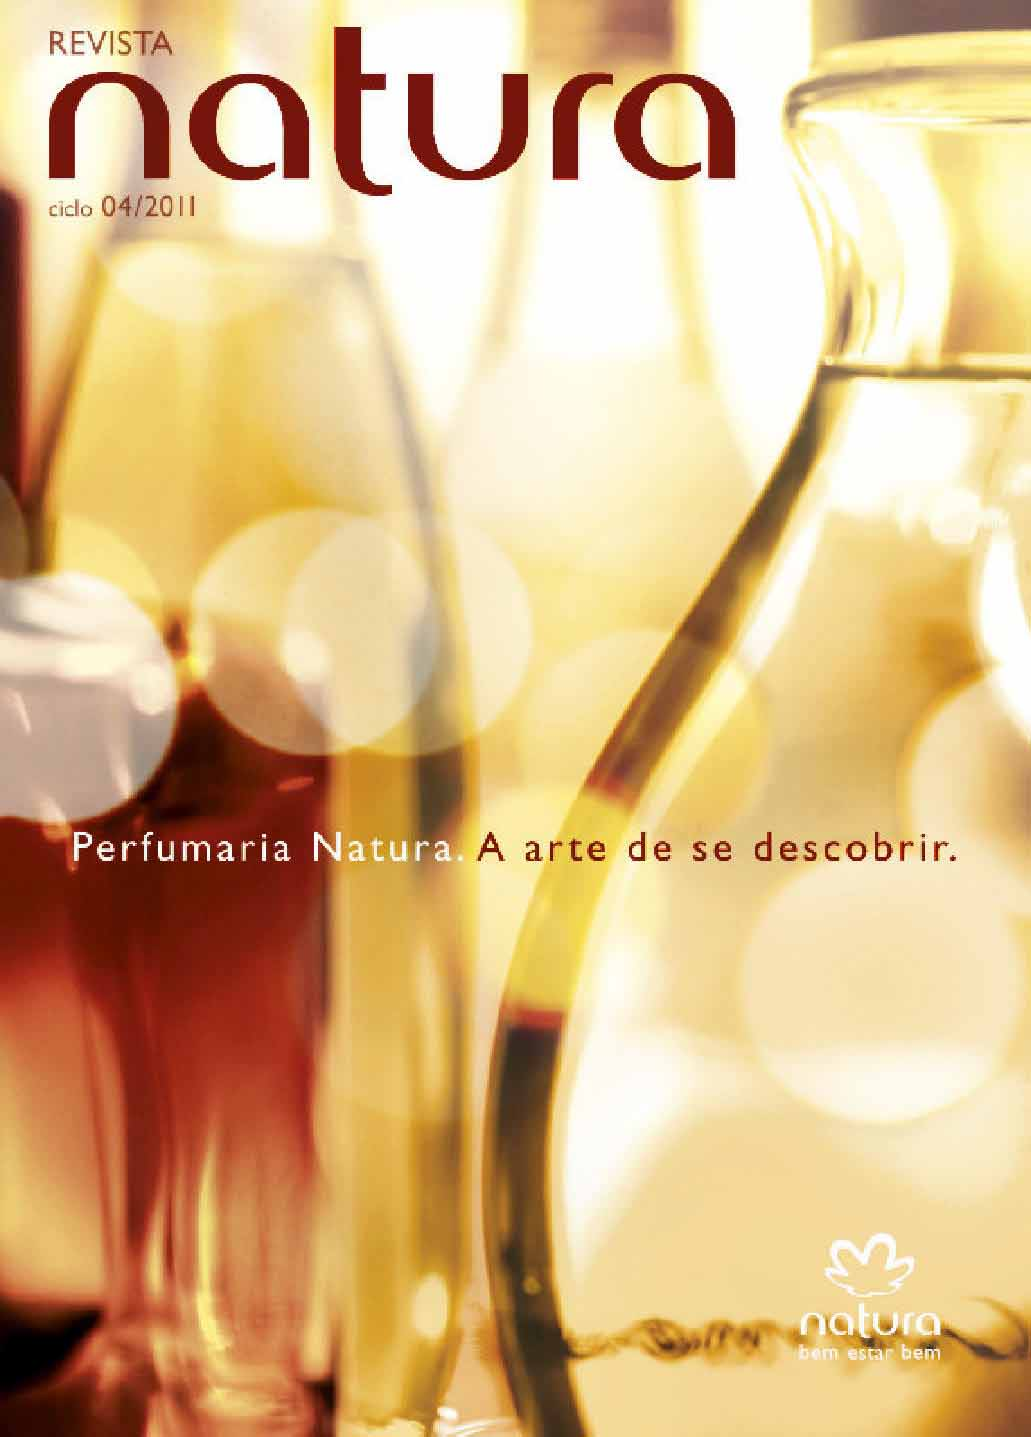 Revista Natura Ciclo 04/2011